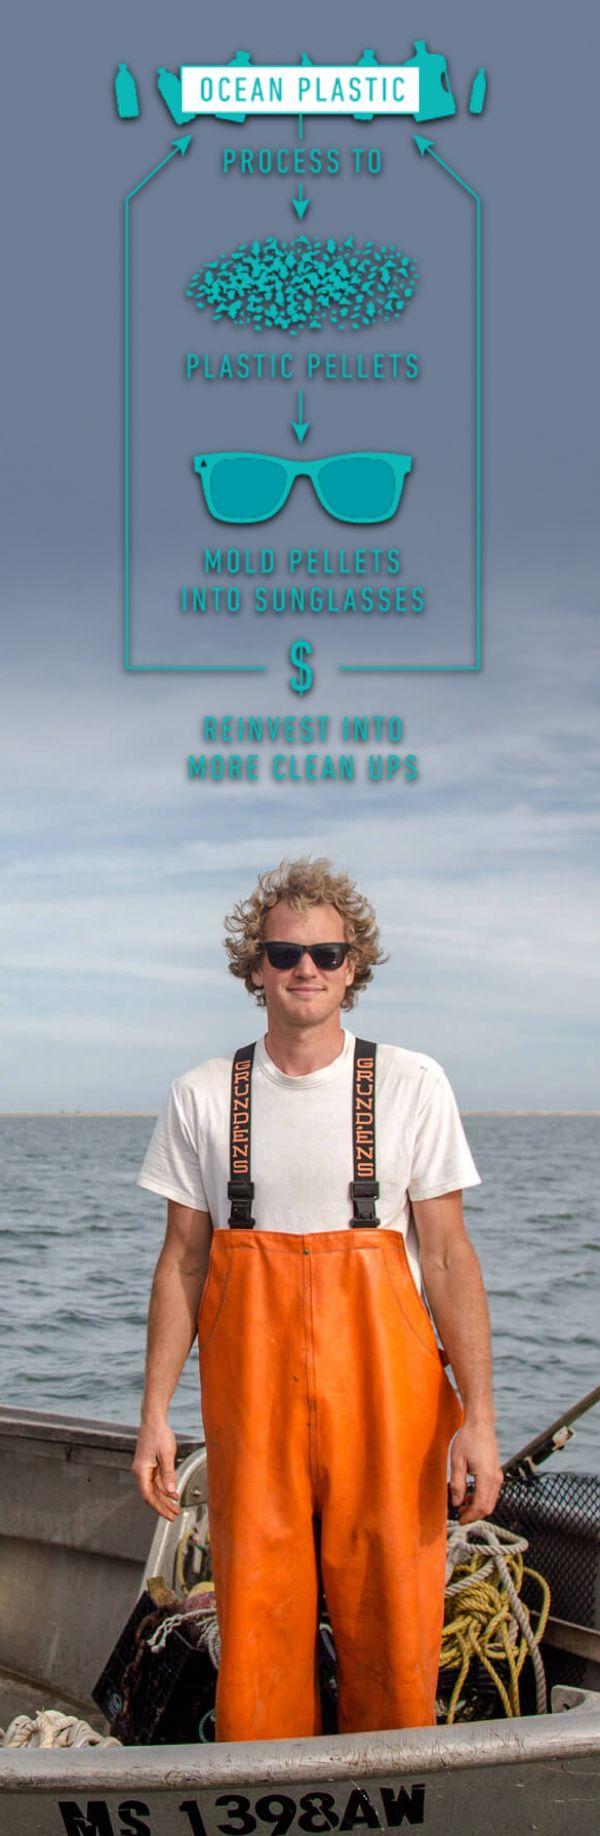 Norton Point Turns Ocean Plastics Into Stylish Sunglasses